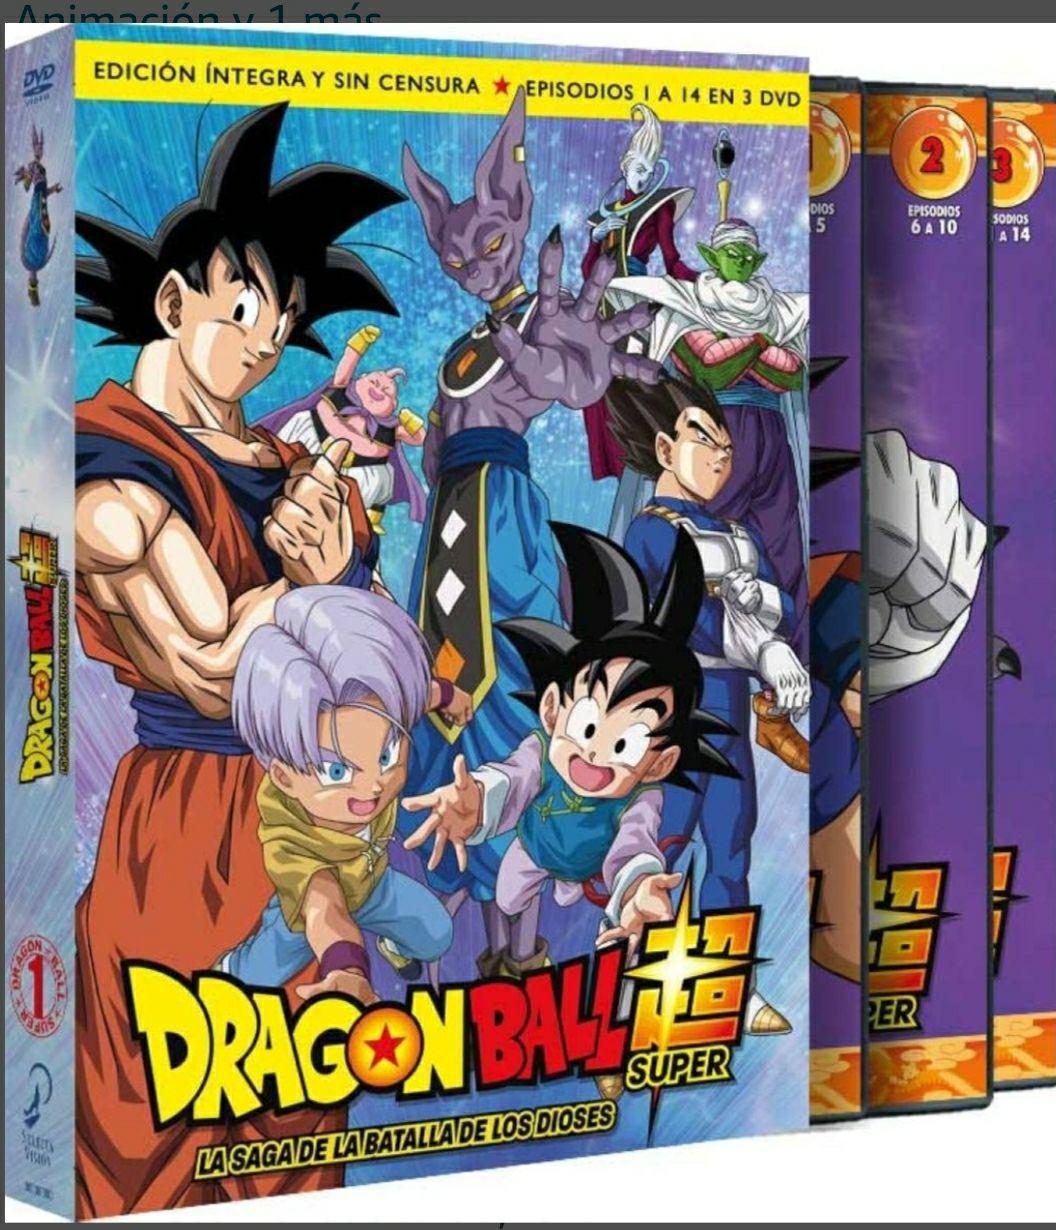 Dragon Ball super box 1 dvd